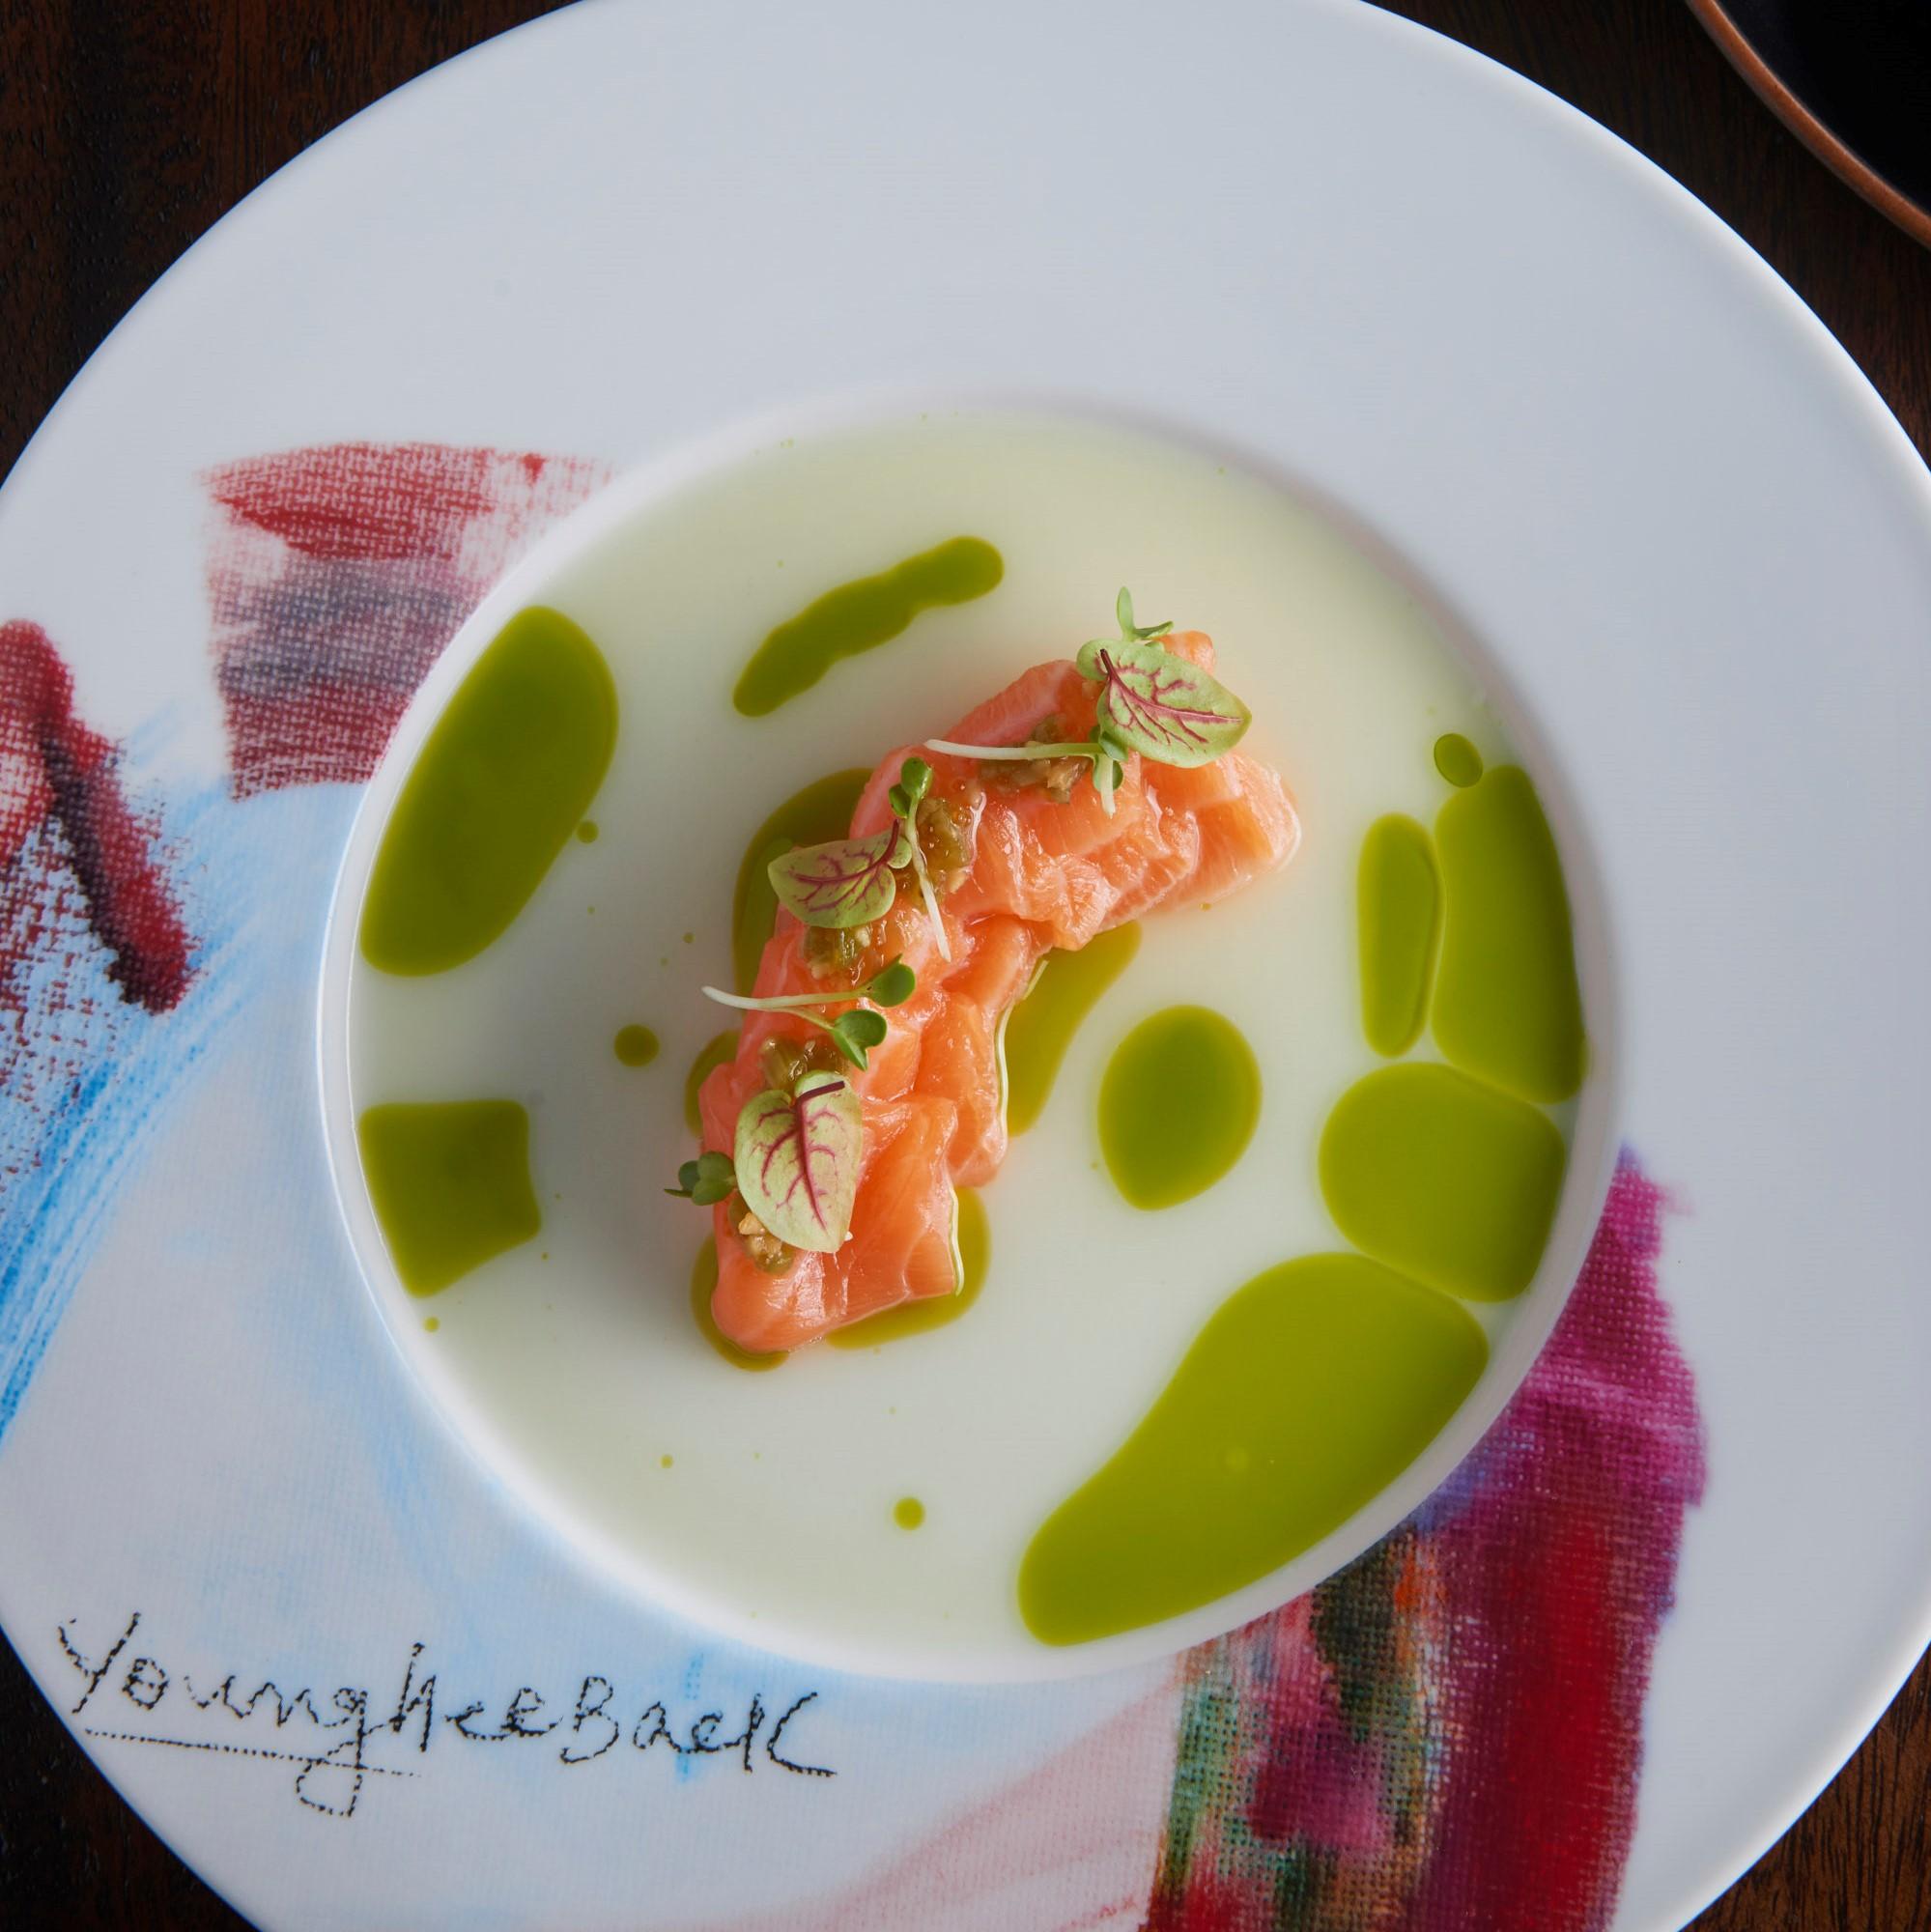 Review: Akira Back brings redefined Asian cuisine to Bangkok